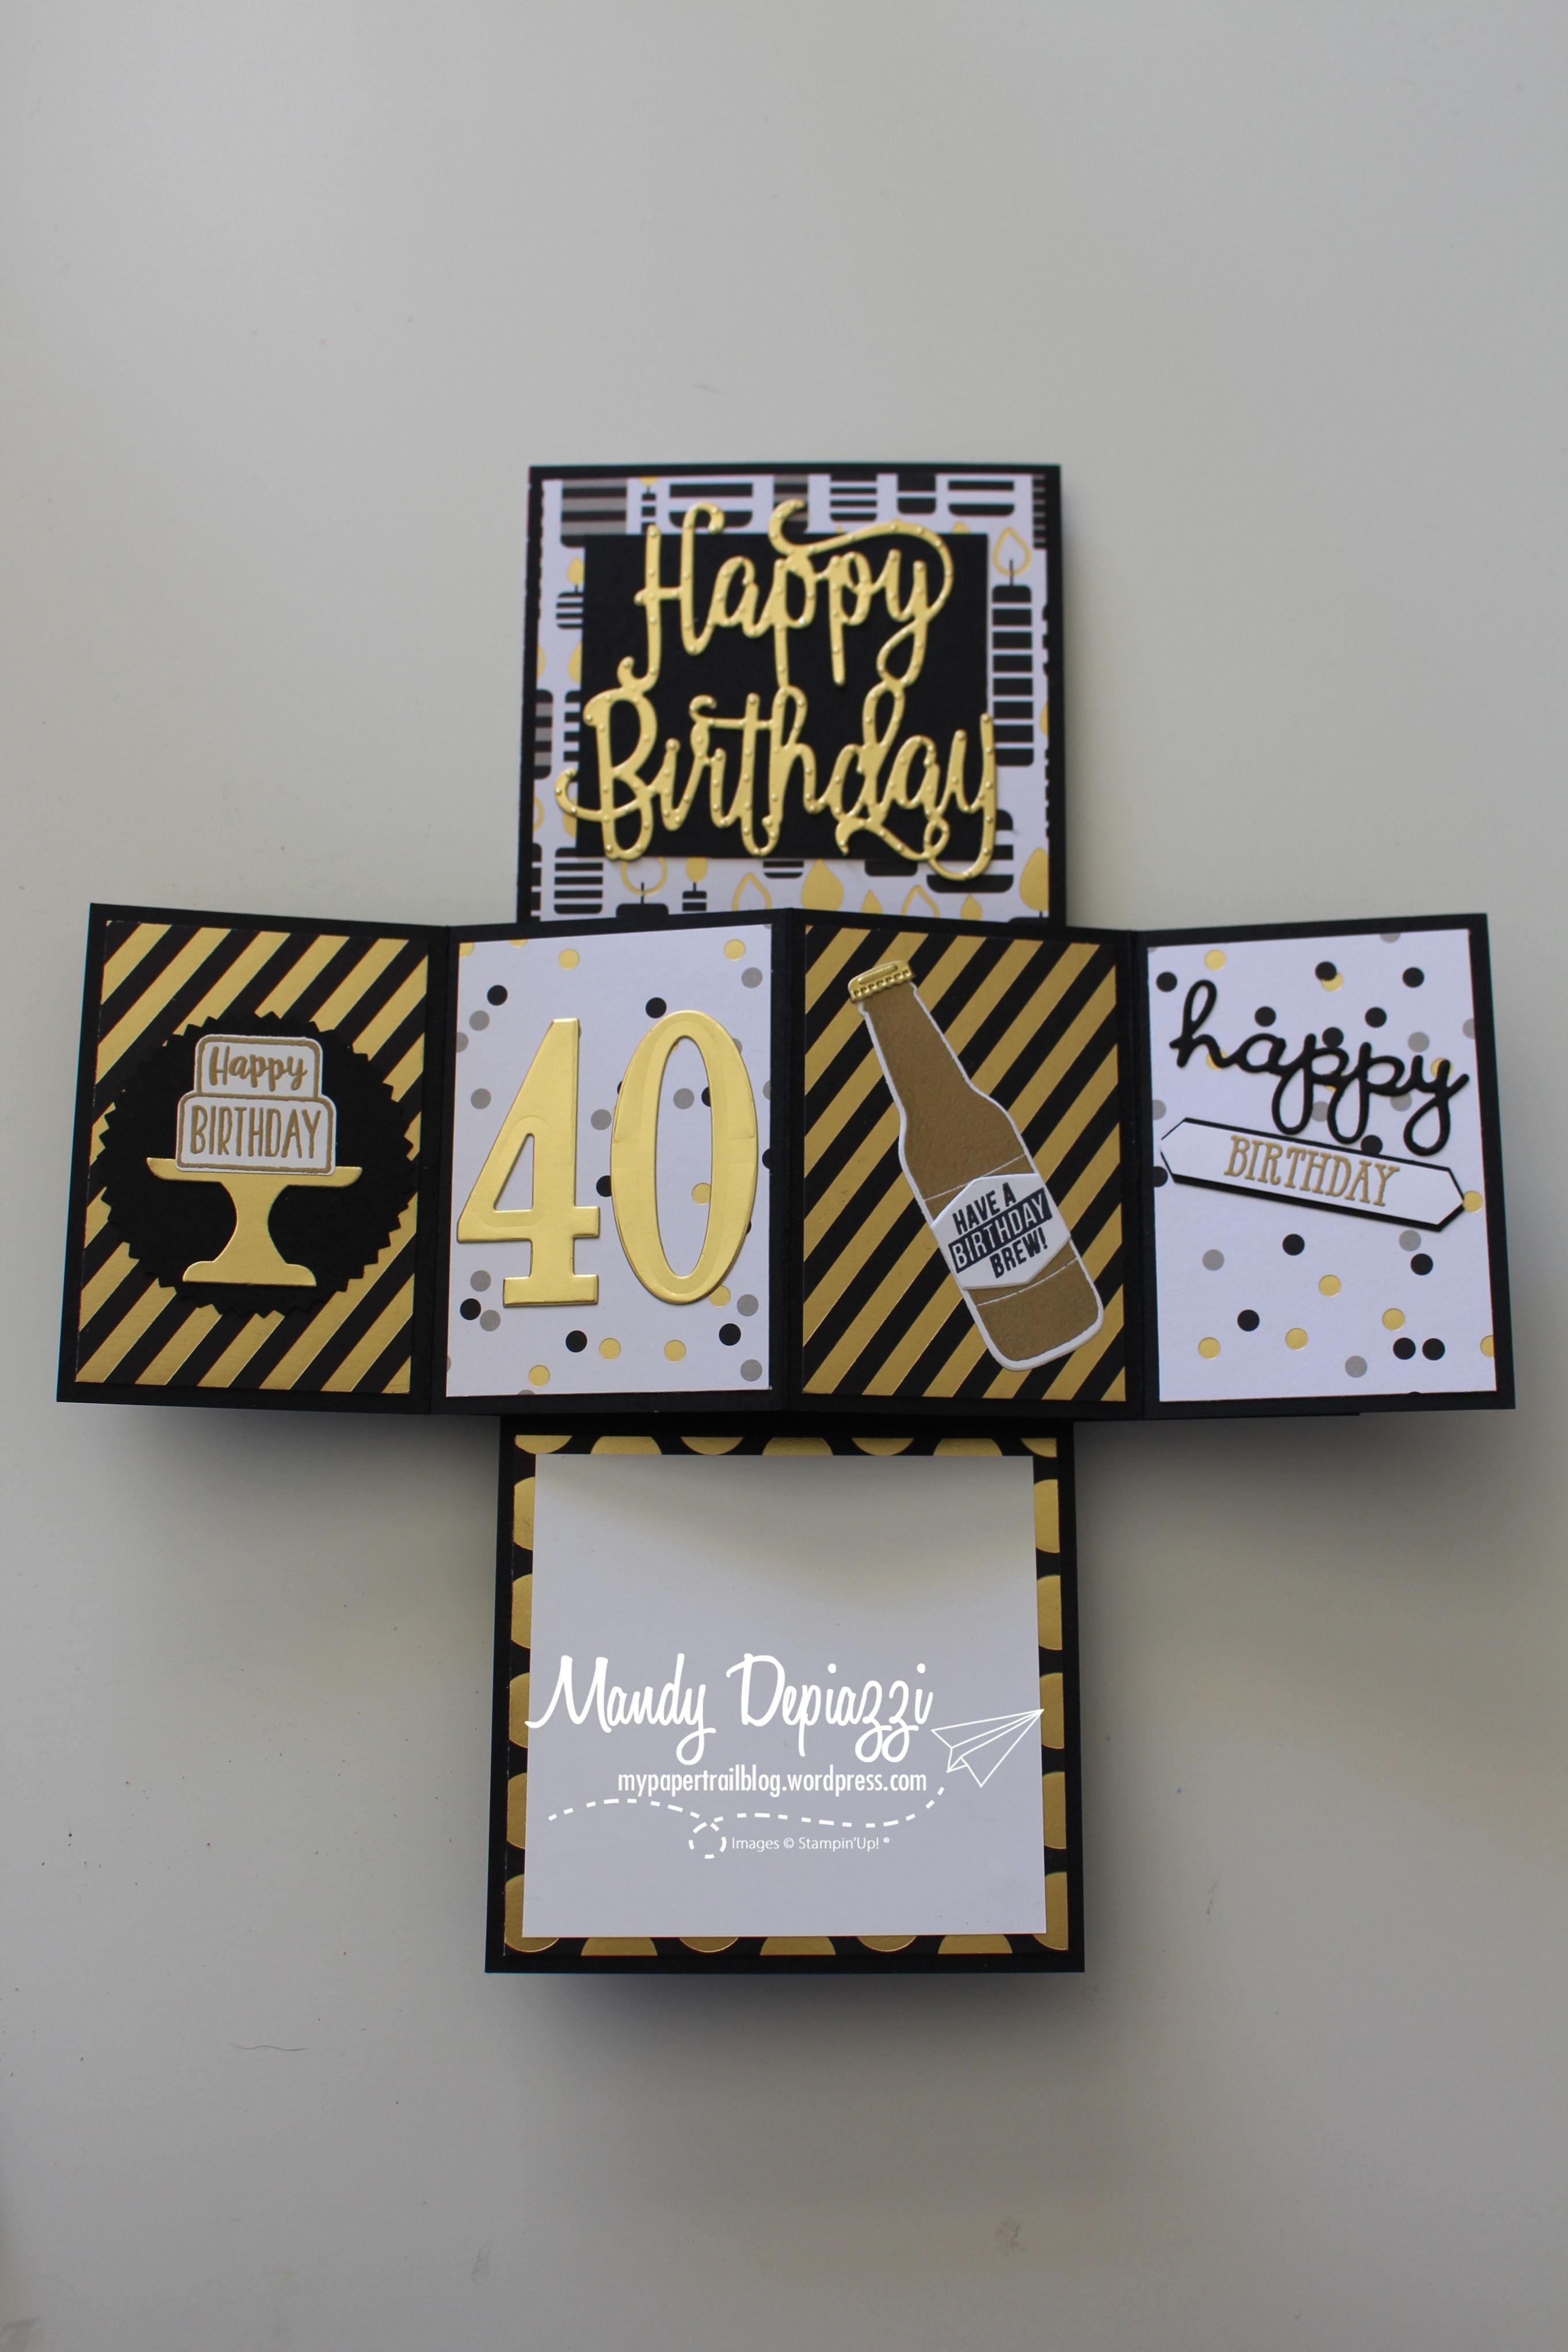 Pop And Twist Card Birthday Card Pop Up 40th Birthday Cards 50th Birthday Cards